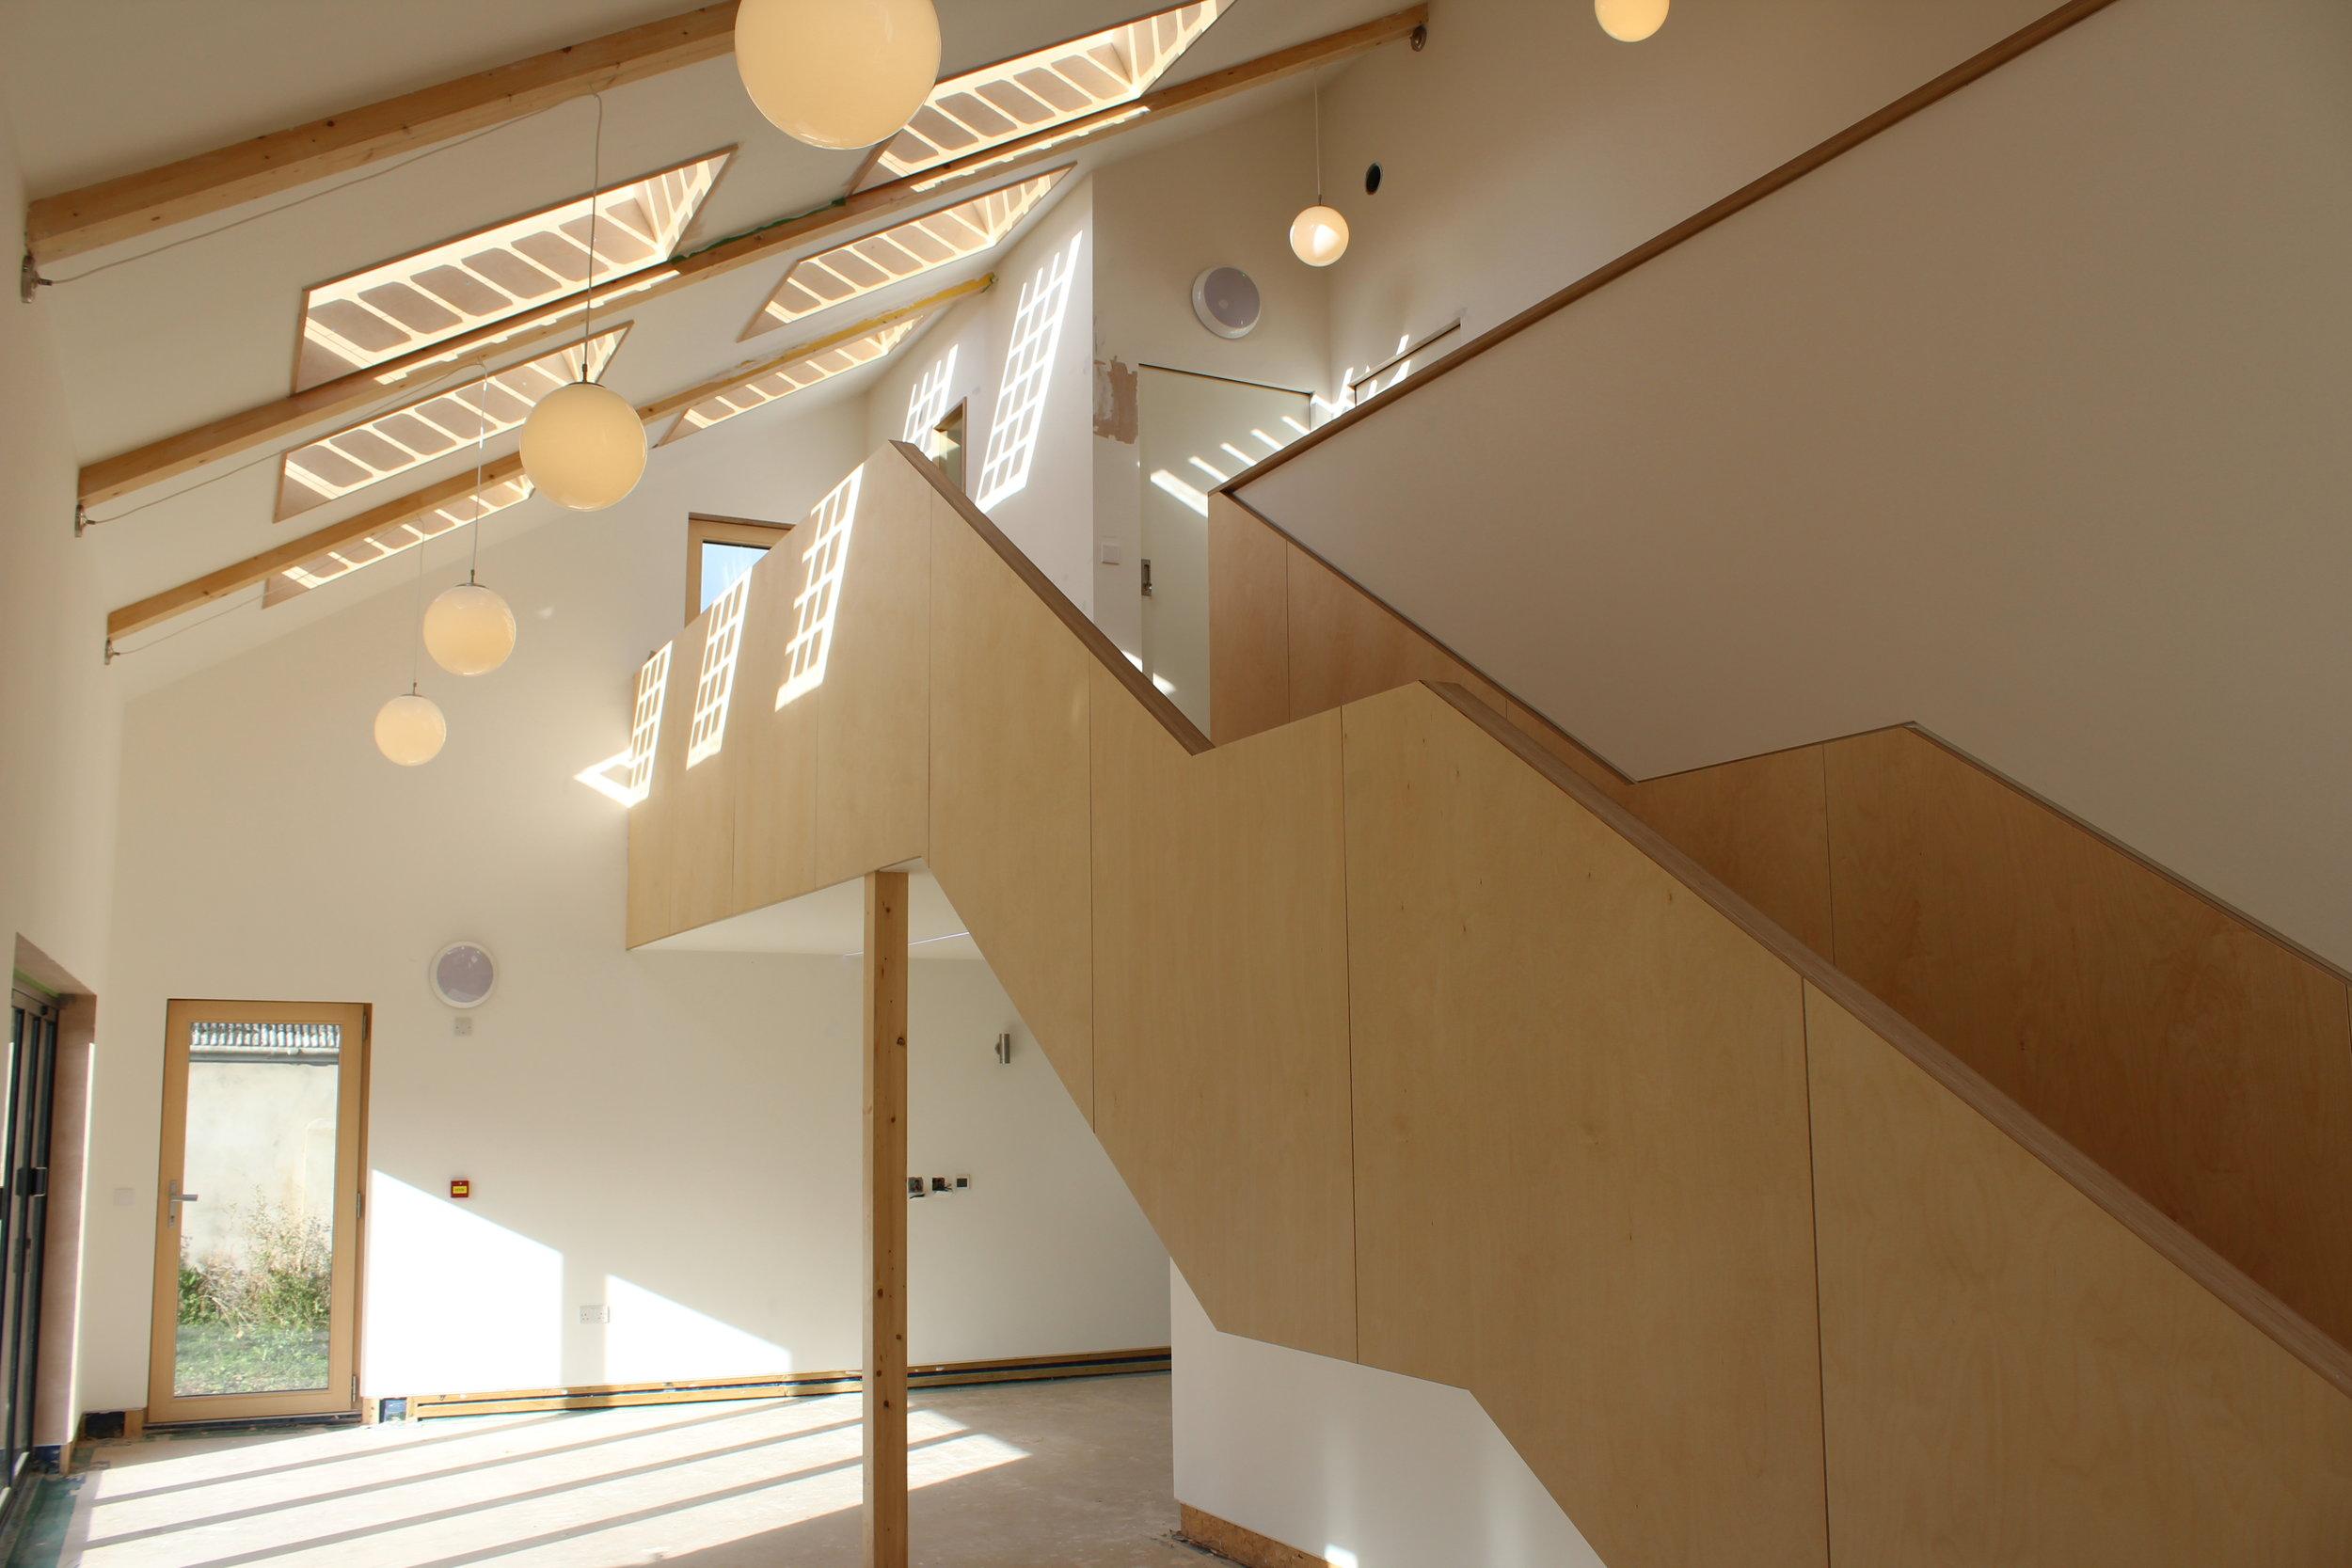 Solarsense by Askew Cavanna Architects